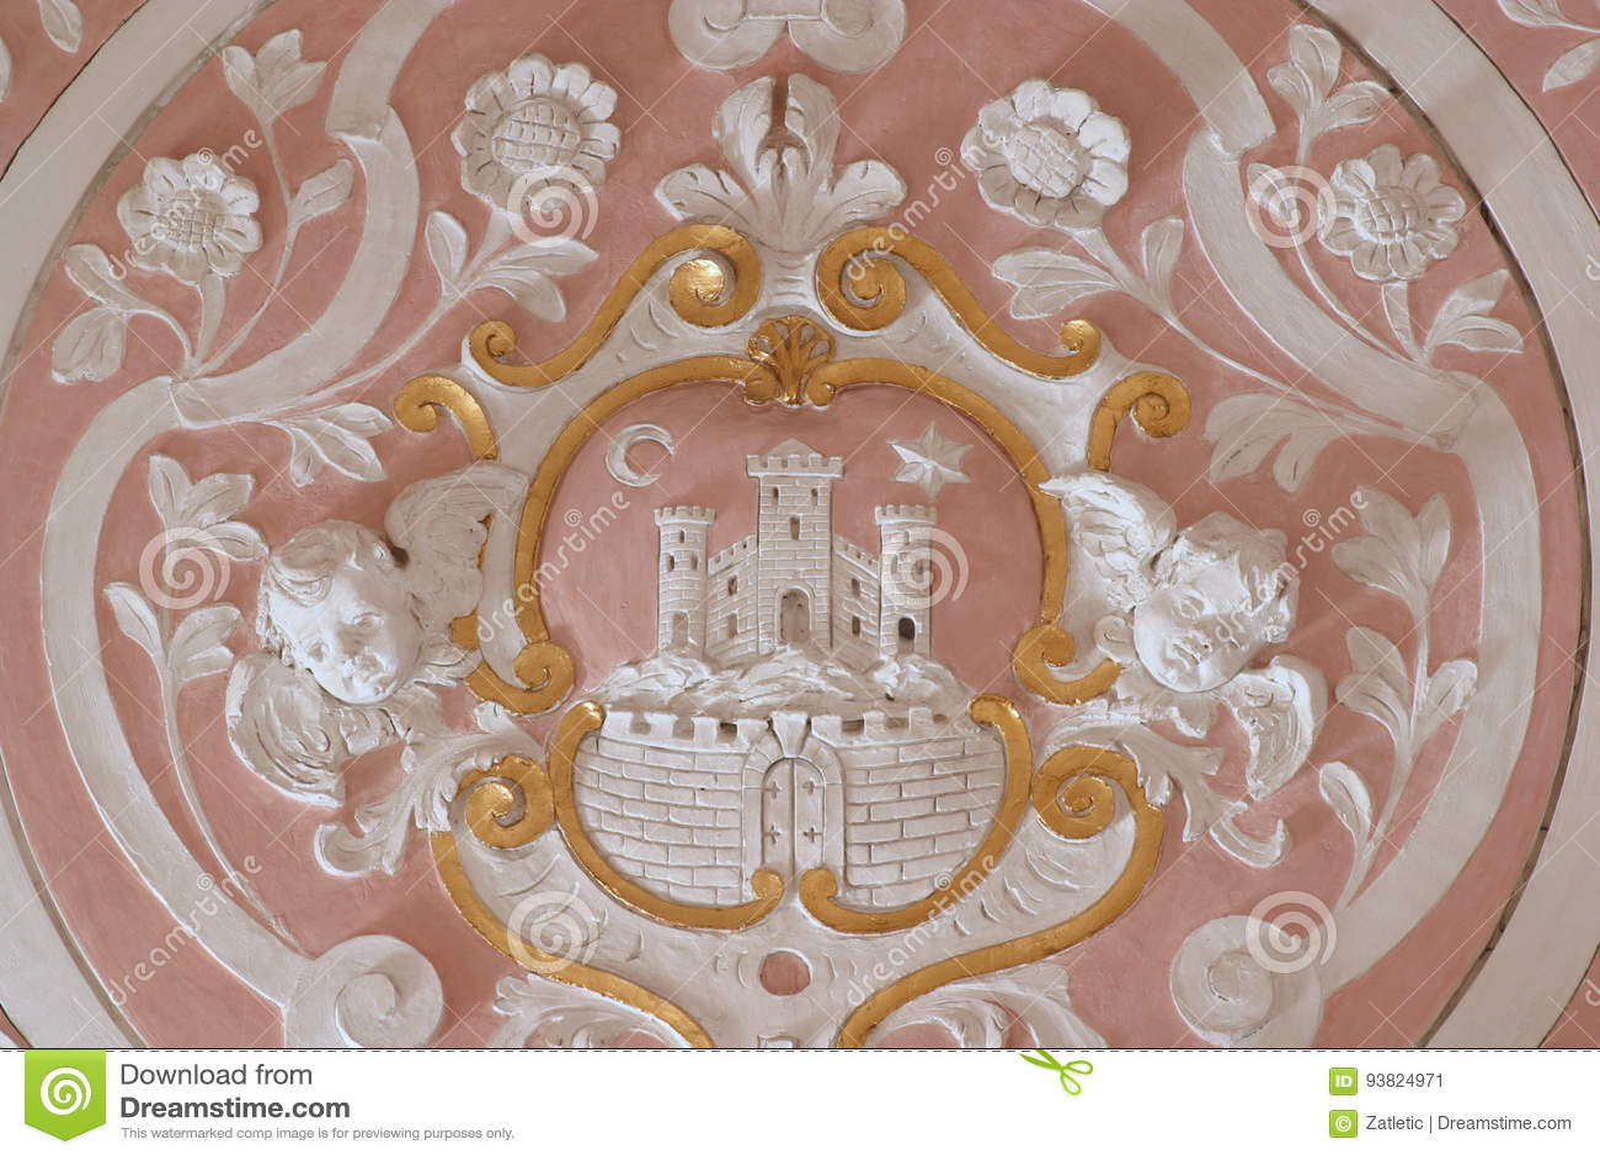 Zagreb, escudo de armas